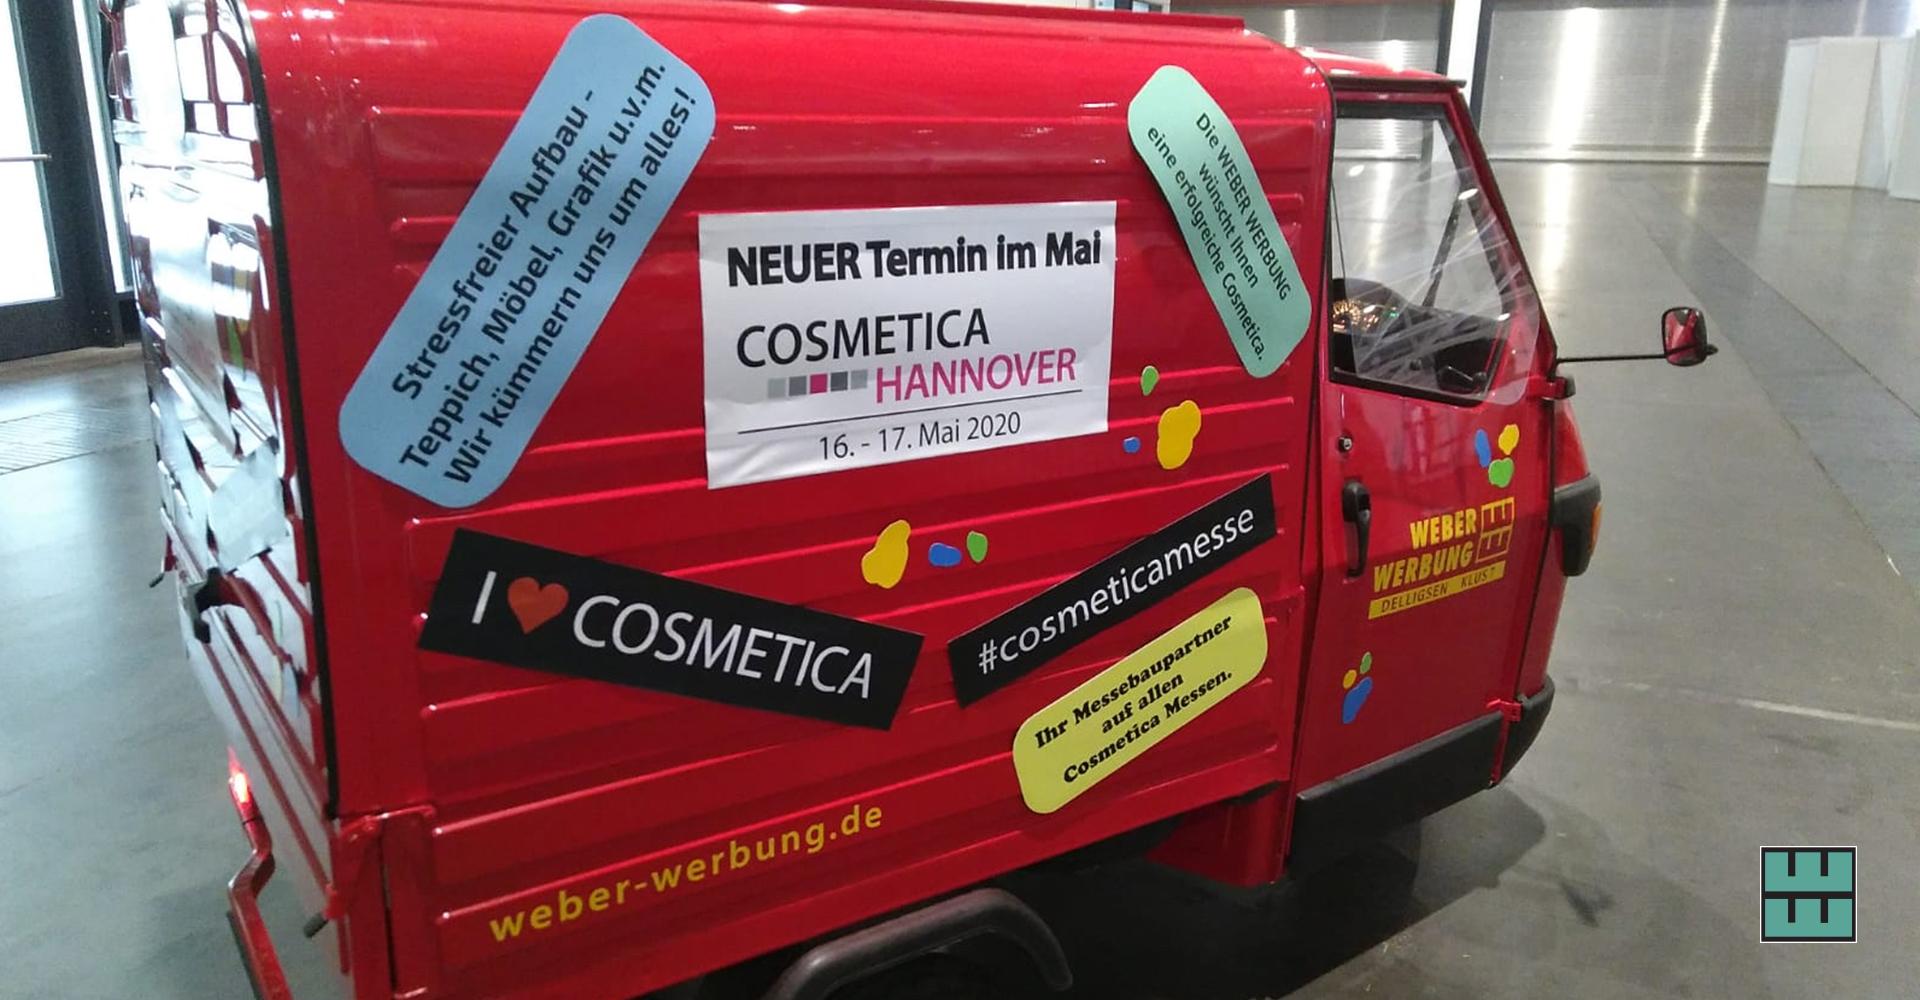 Cosmetica Hannover 2019 Messebau Work in Progress Alfeld Niedersachsen